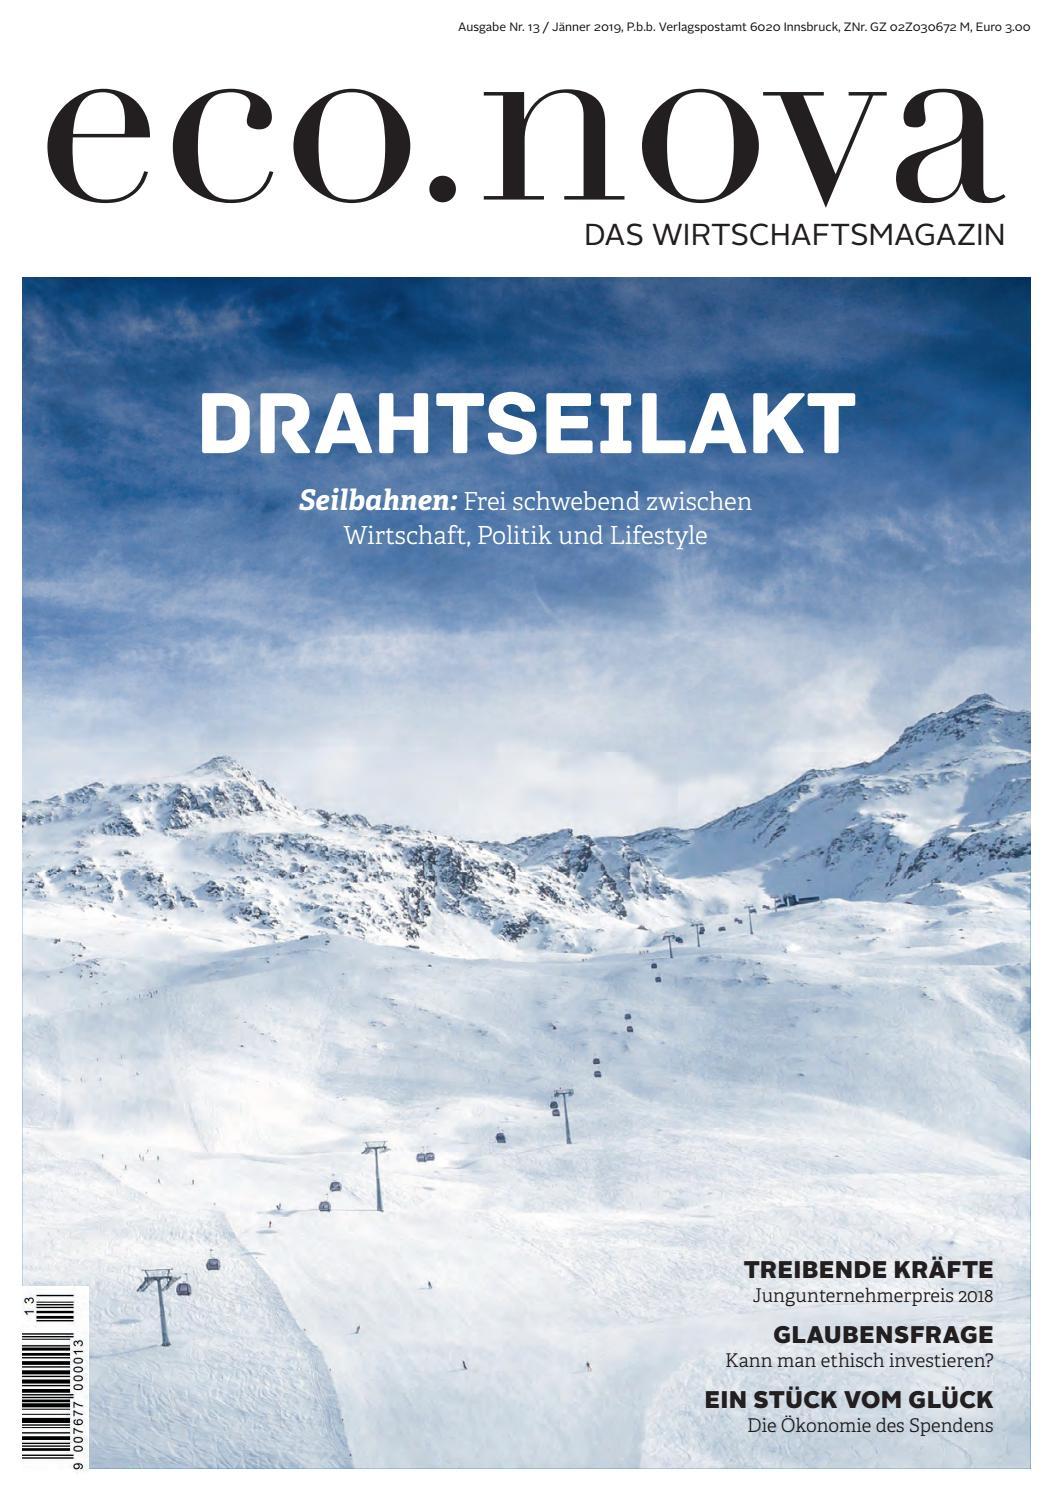 Singlebrse Innsbruck bei Innsbruck-Stadt Singletreff: Sie